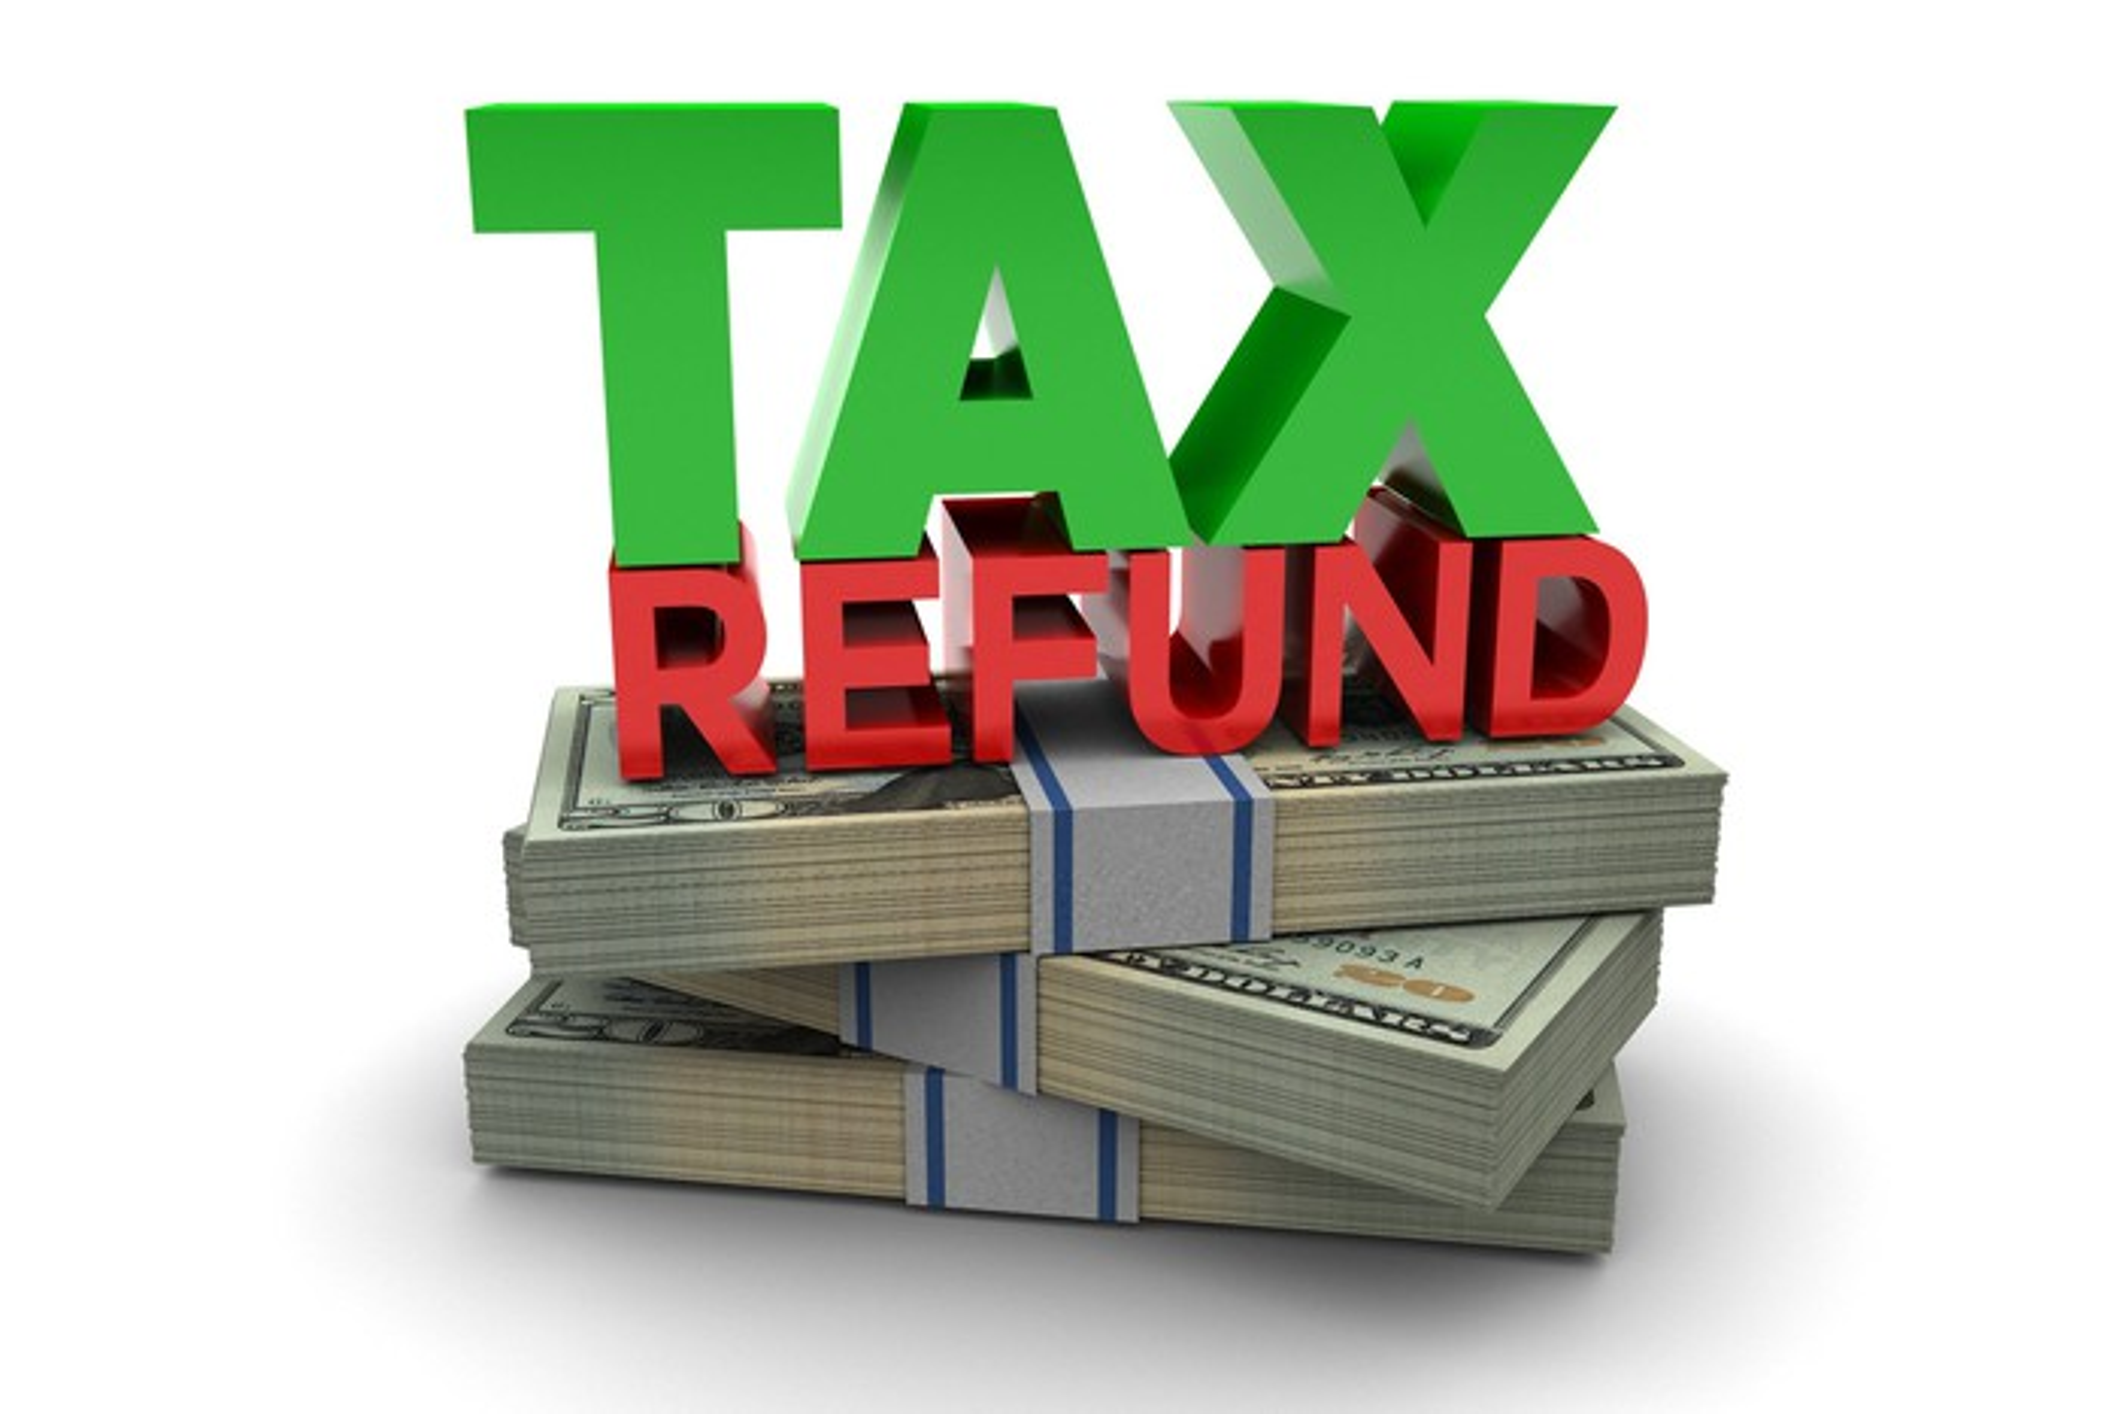 The words tax refund on top of three stacks of twenty dollar bills.